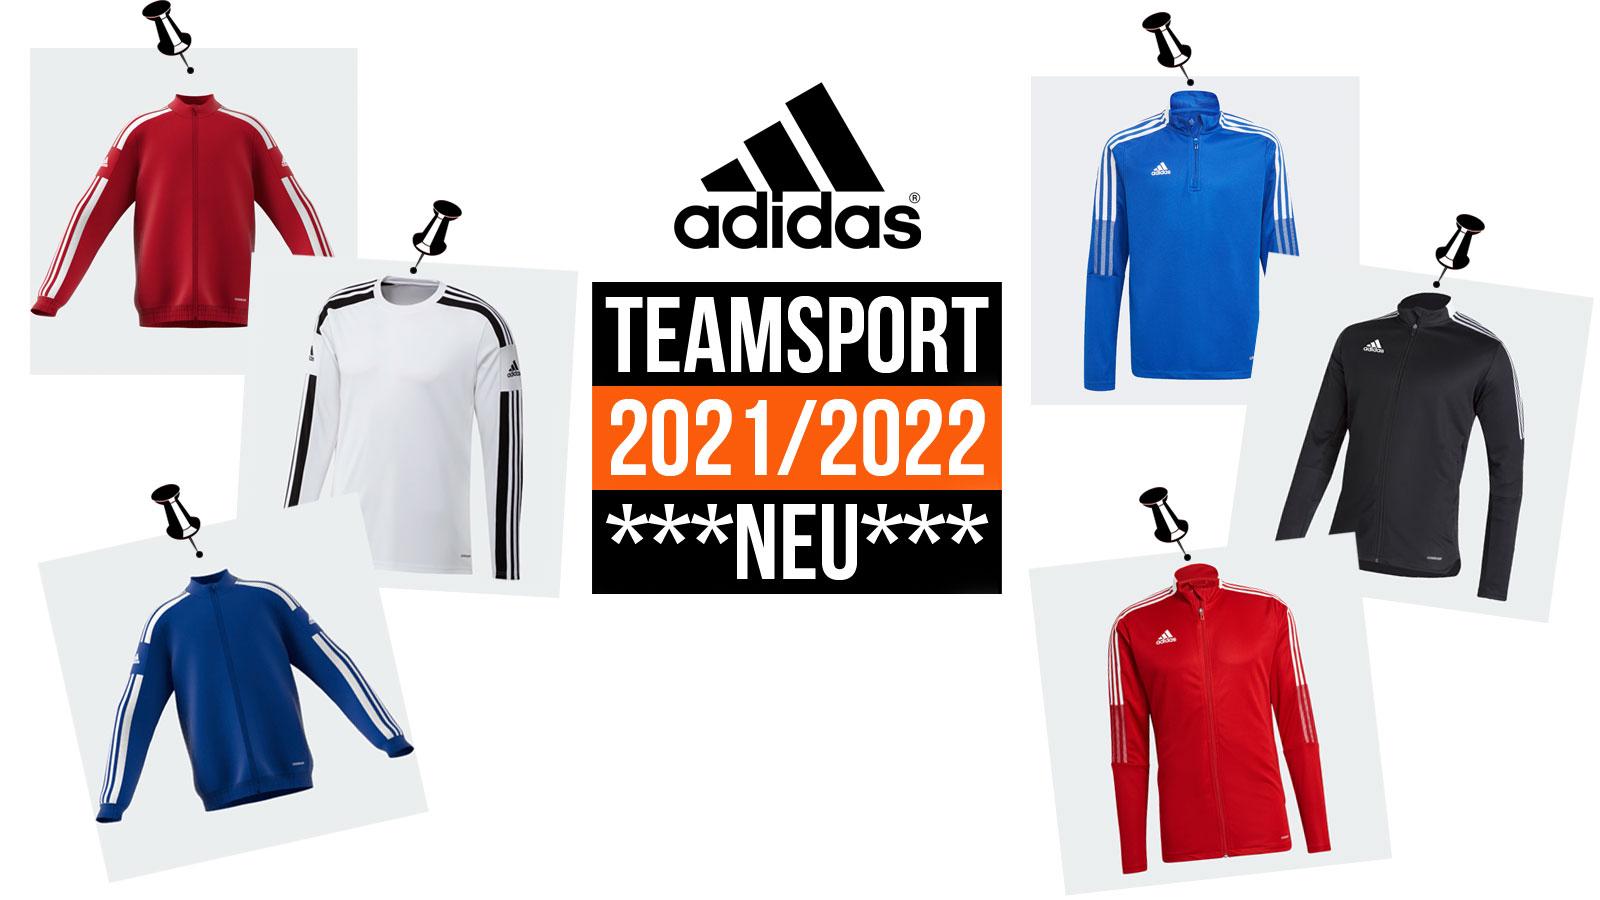 adidas teamsport 2021/2021 mit adidas Tiro 21 und adidas Squadra 21